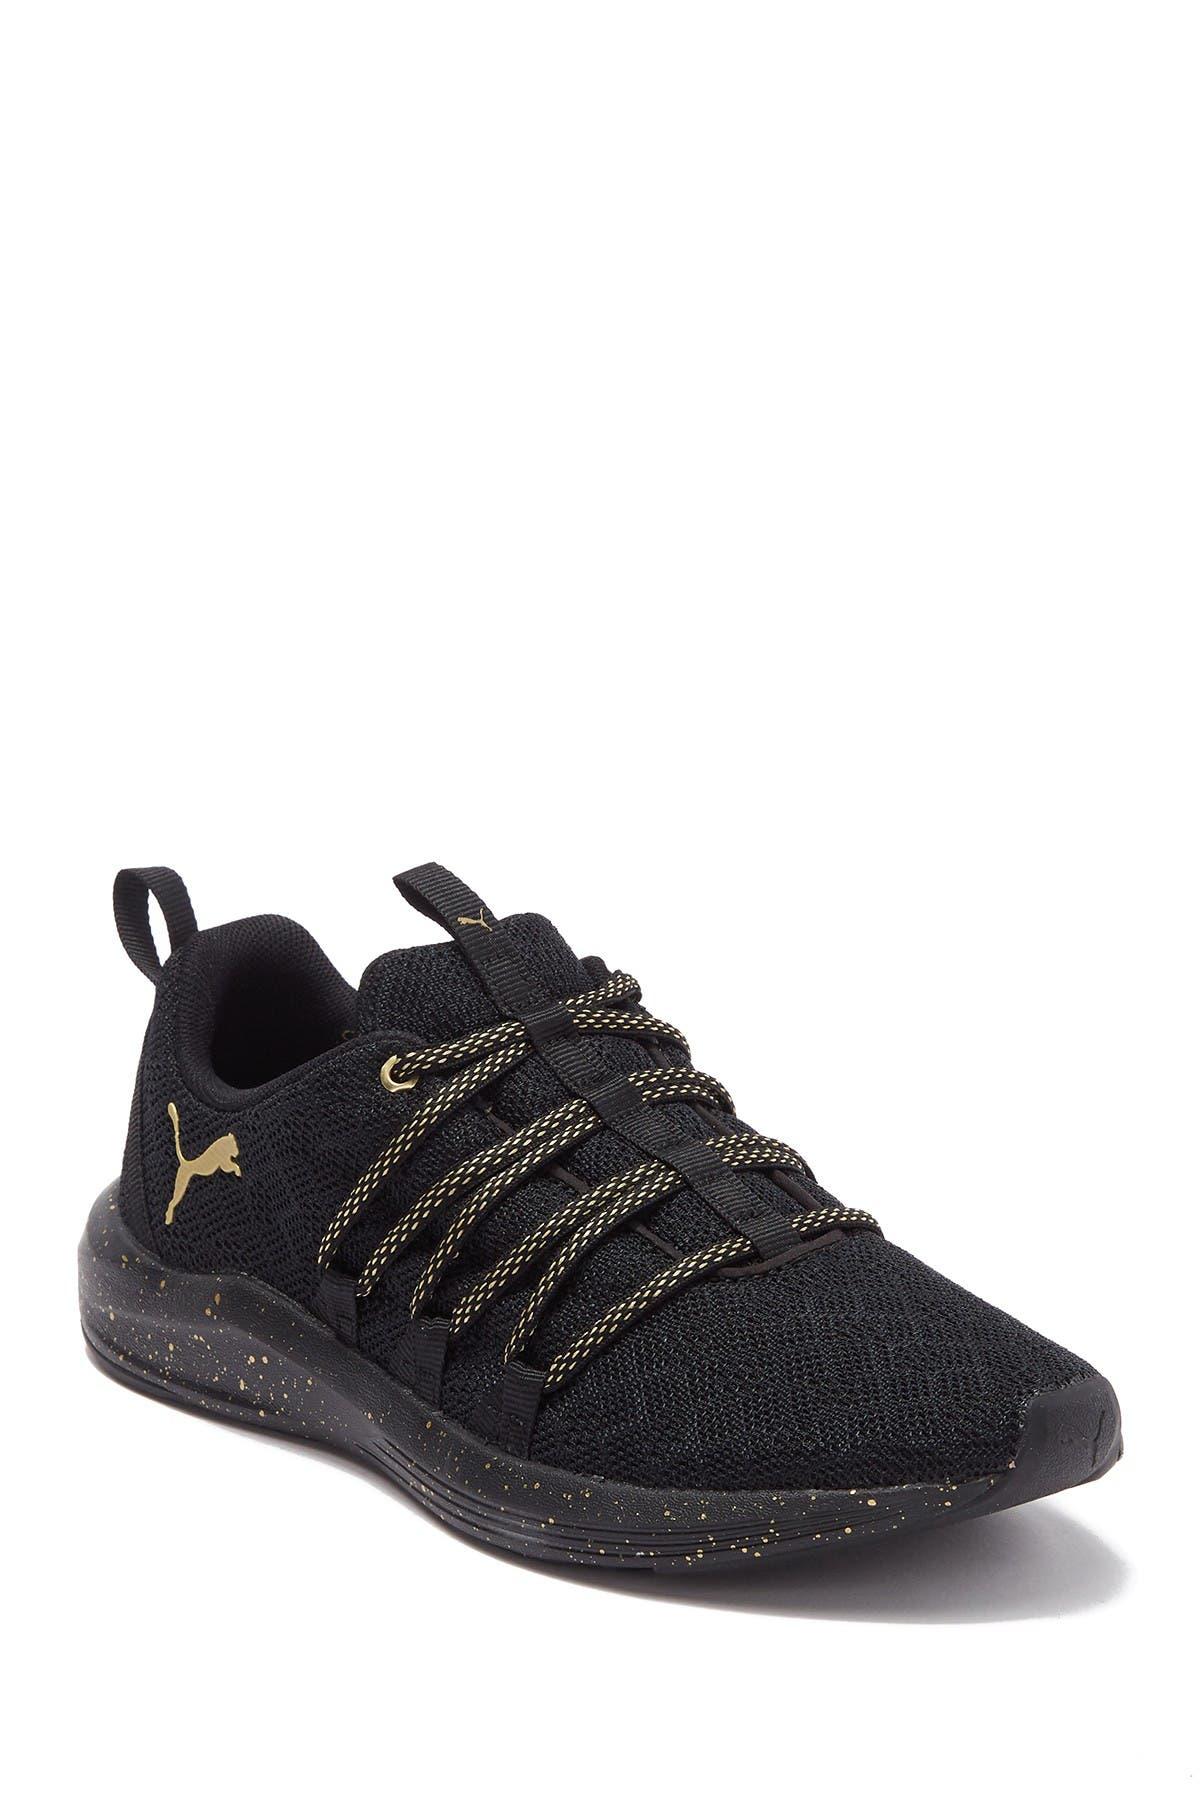 PUMA | Prowl Alt Mesh Speckle Sneakers